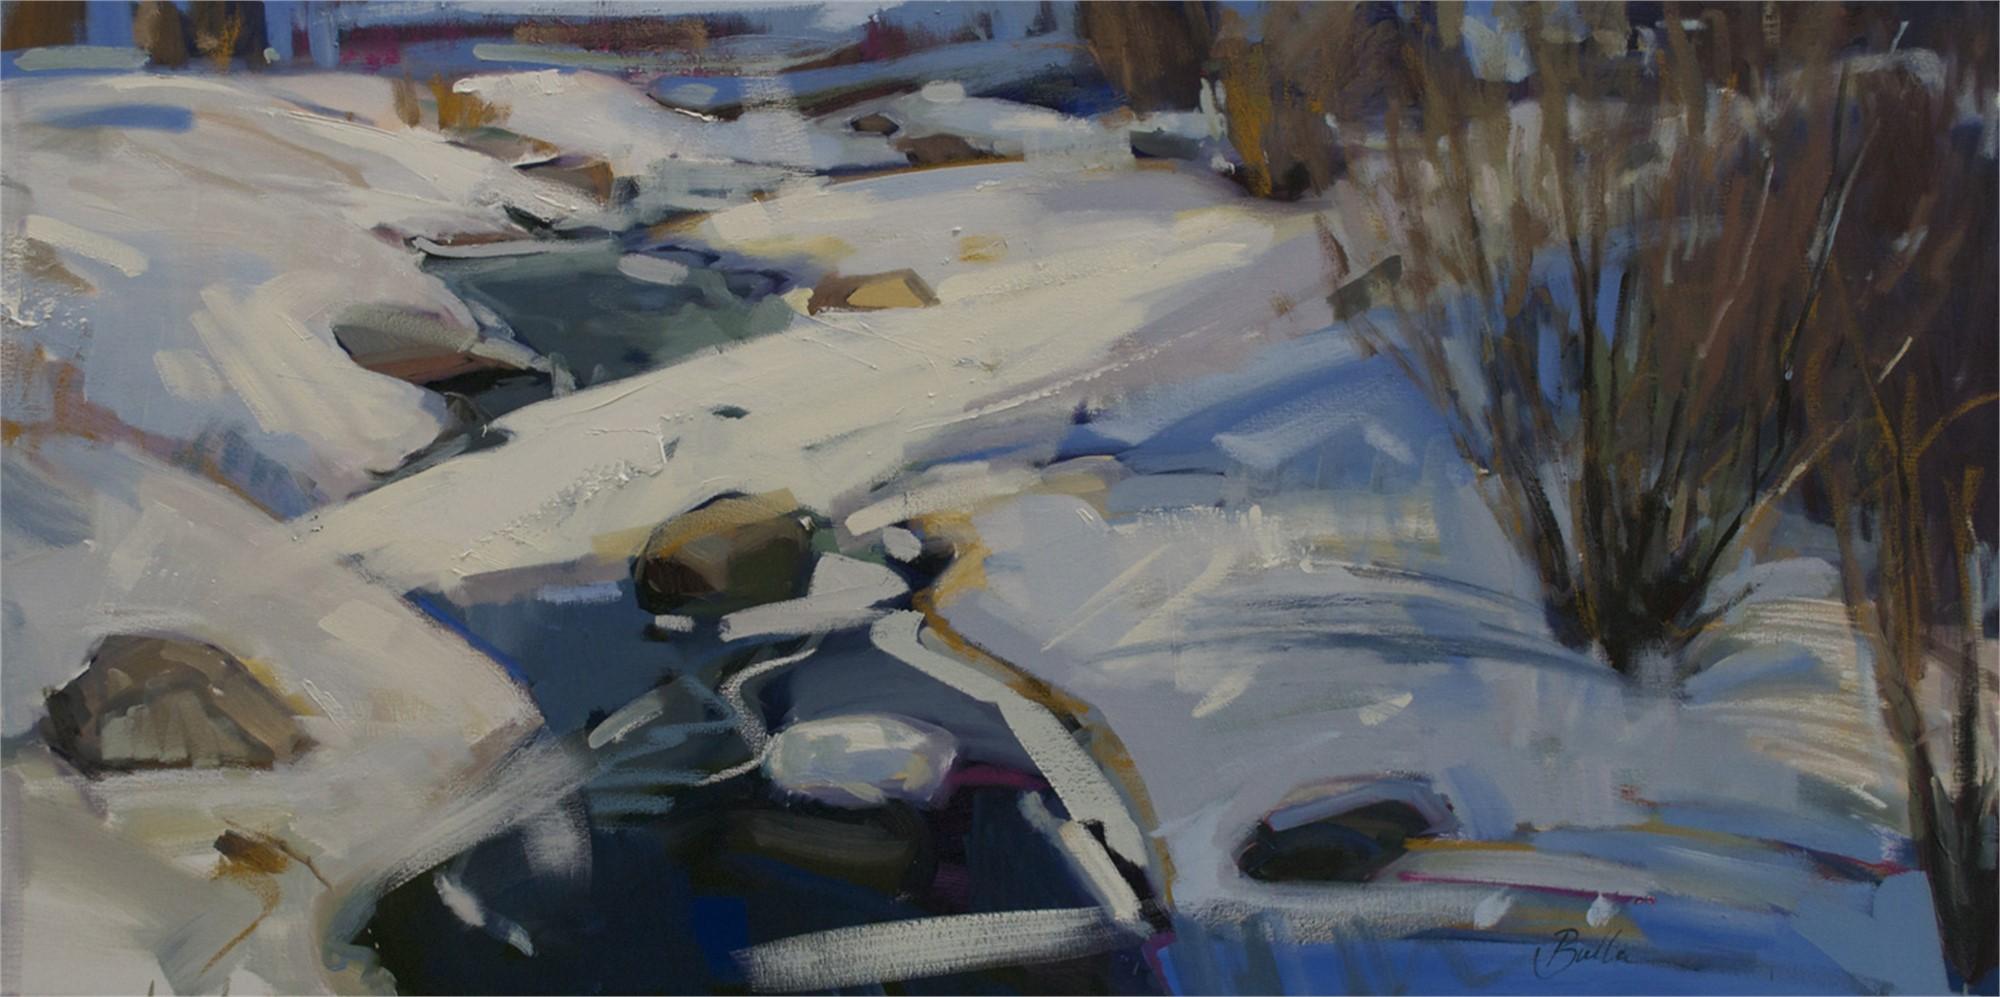 Snowy Day by Samantha Buller